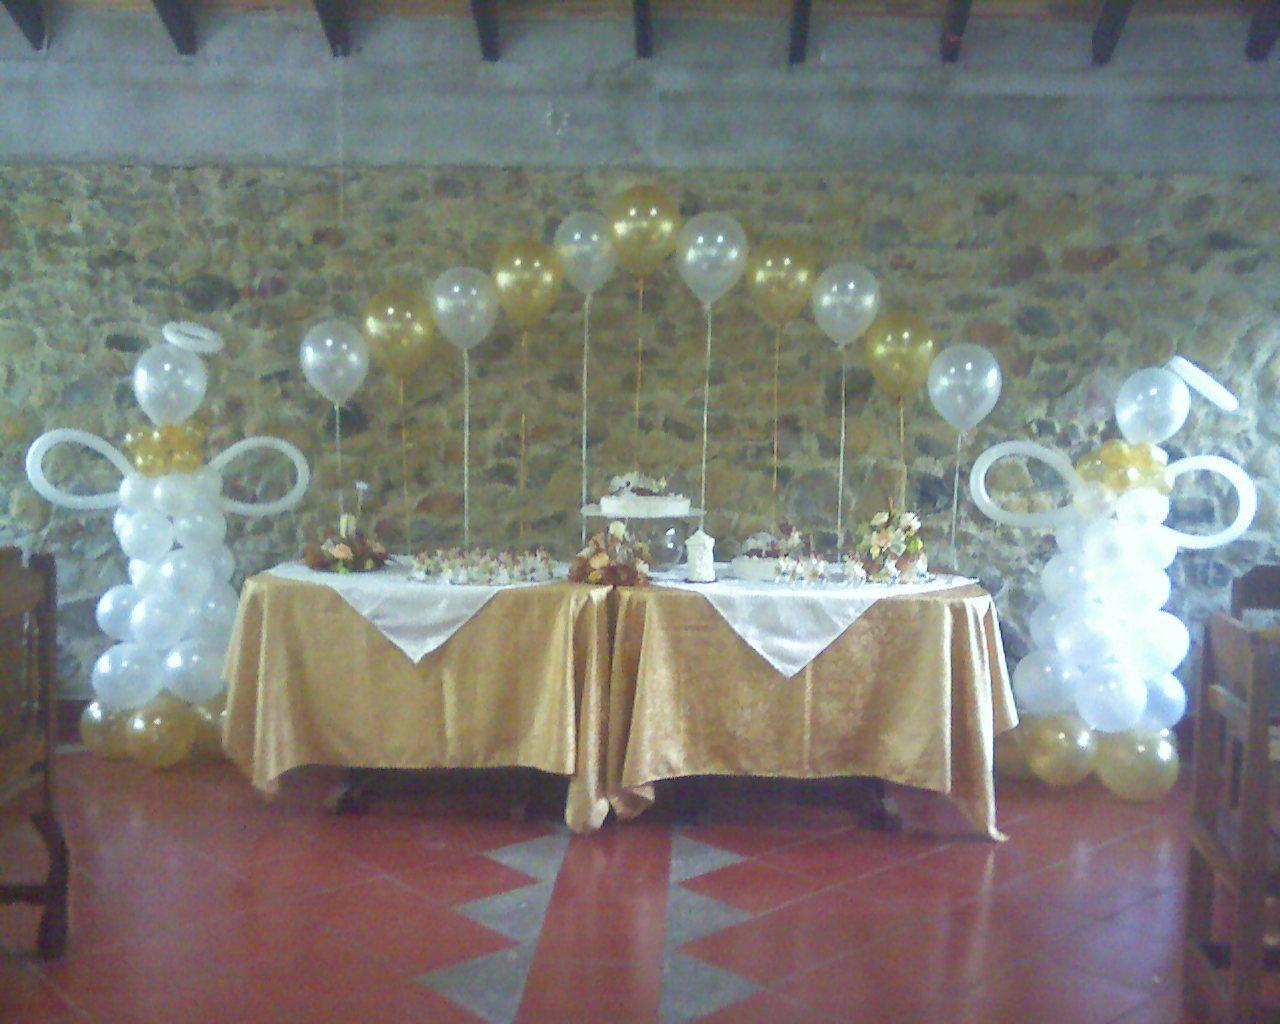 Casa de eventos castillo de luna primera comunion - Decoracion comunion en casa ...